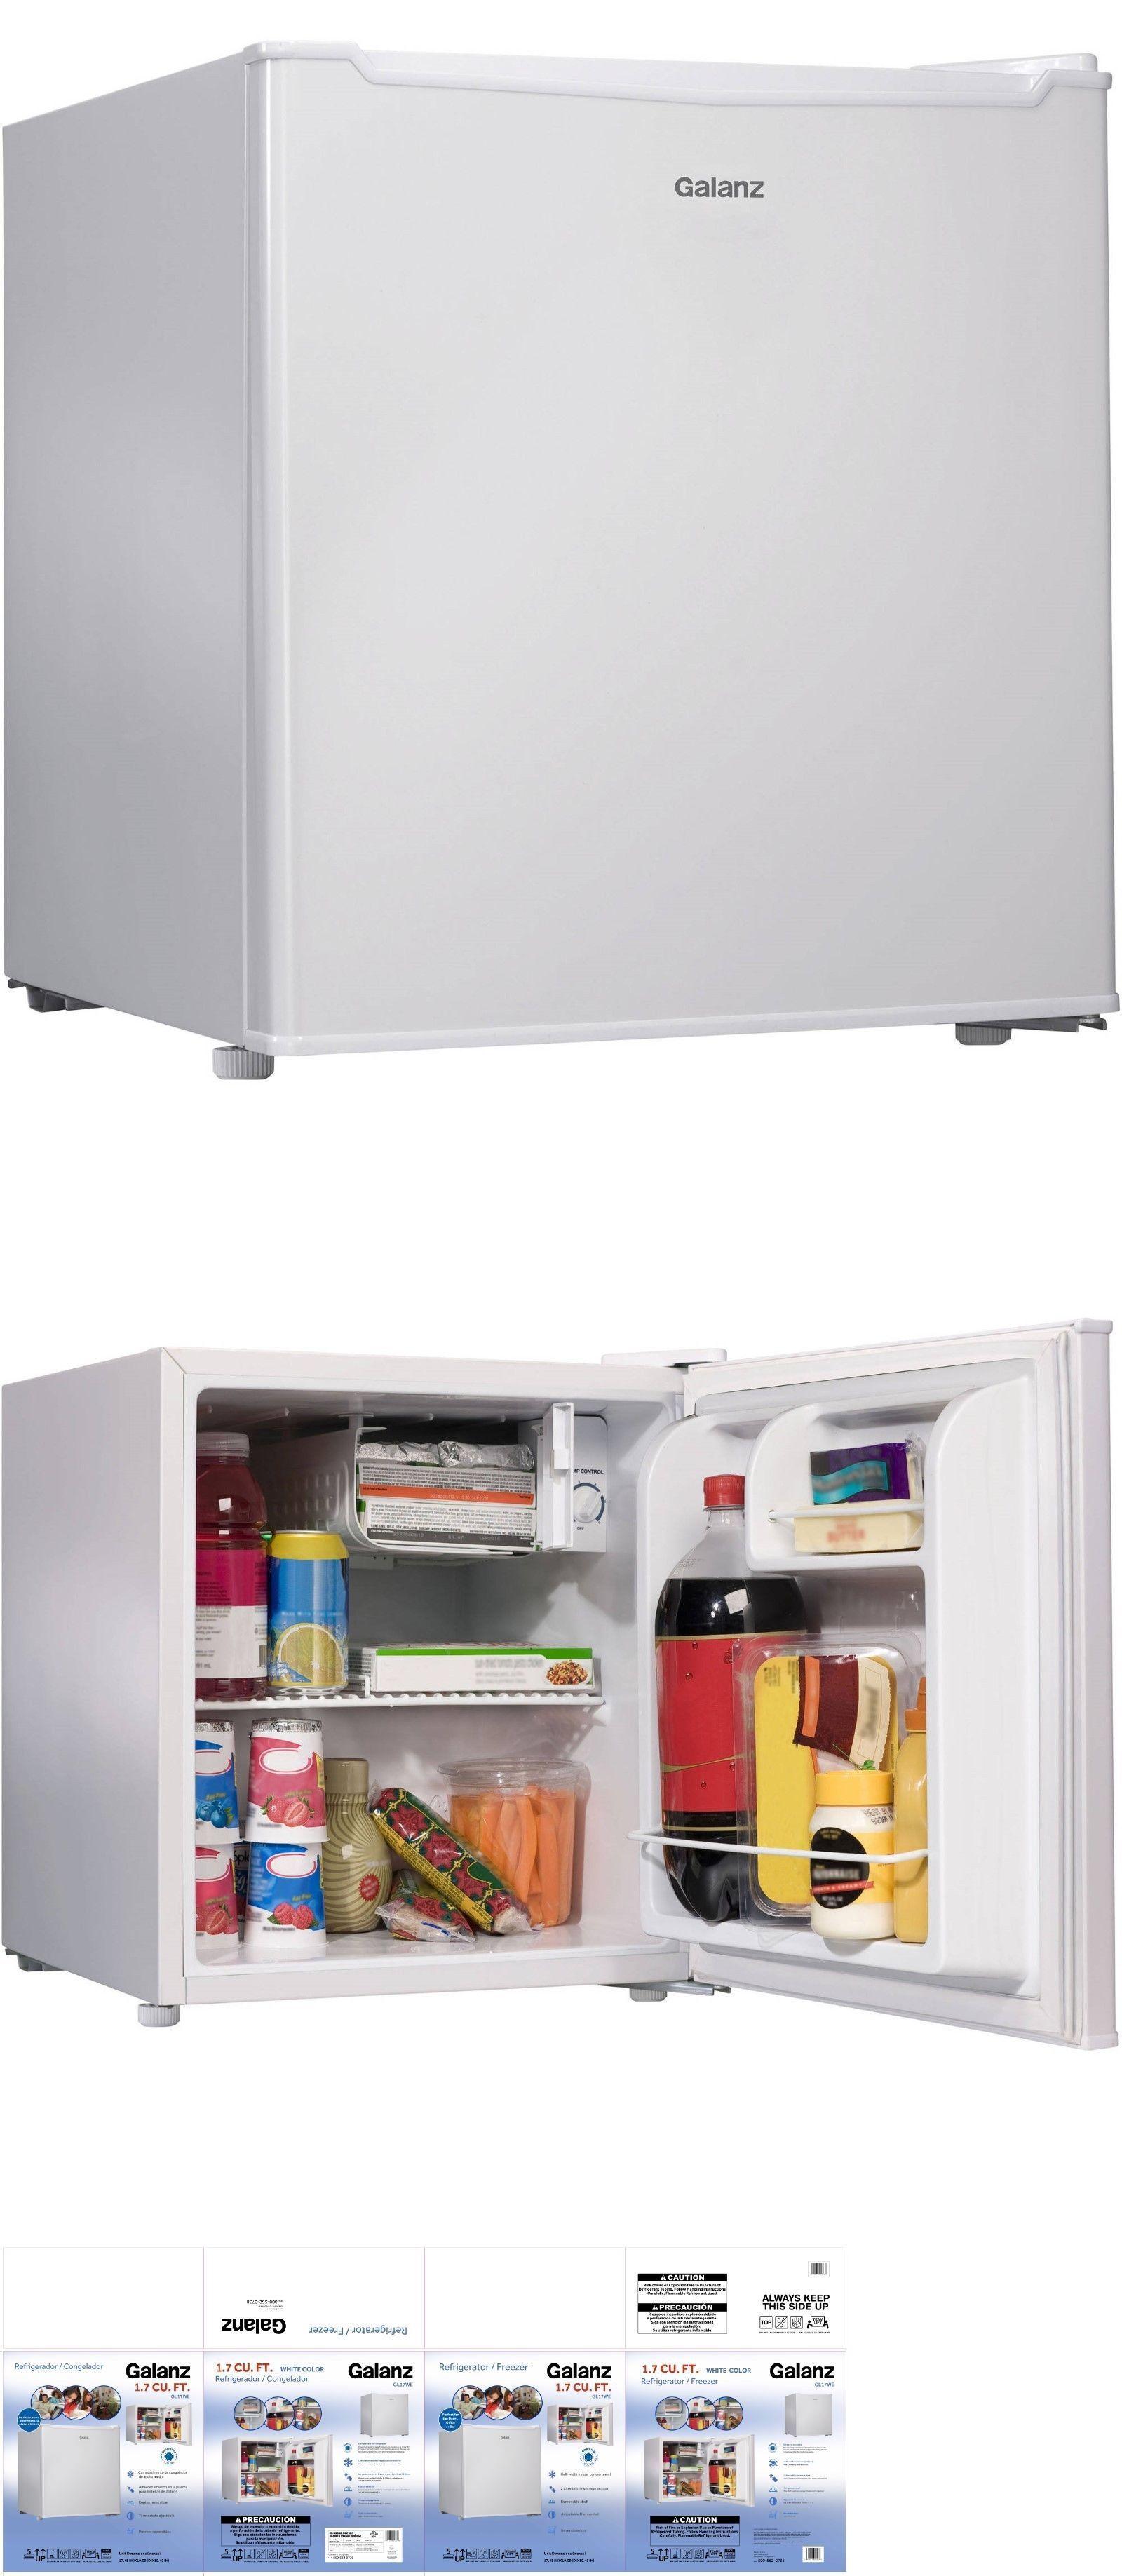 Mini Fridges 71262 Galanz 1 7 Cu Ft Single Door Compact Refrigerator Mini Fridge White Refrigerator Sale Appliances Storage Apartment Size Refrigerator